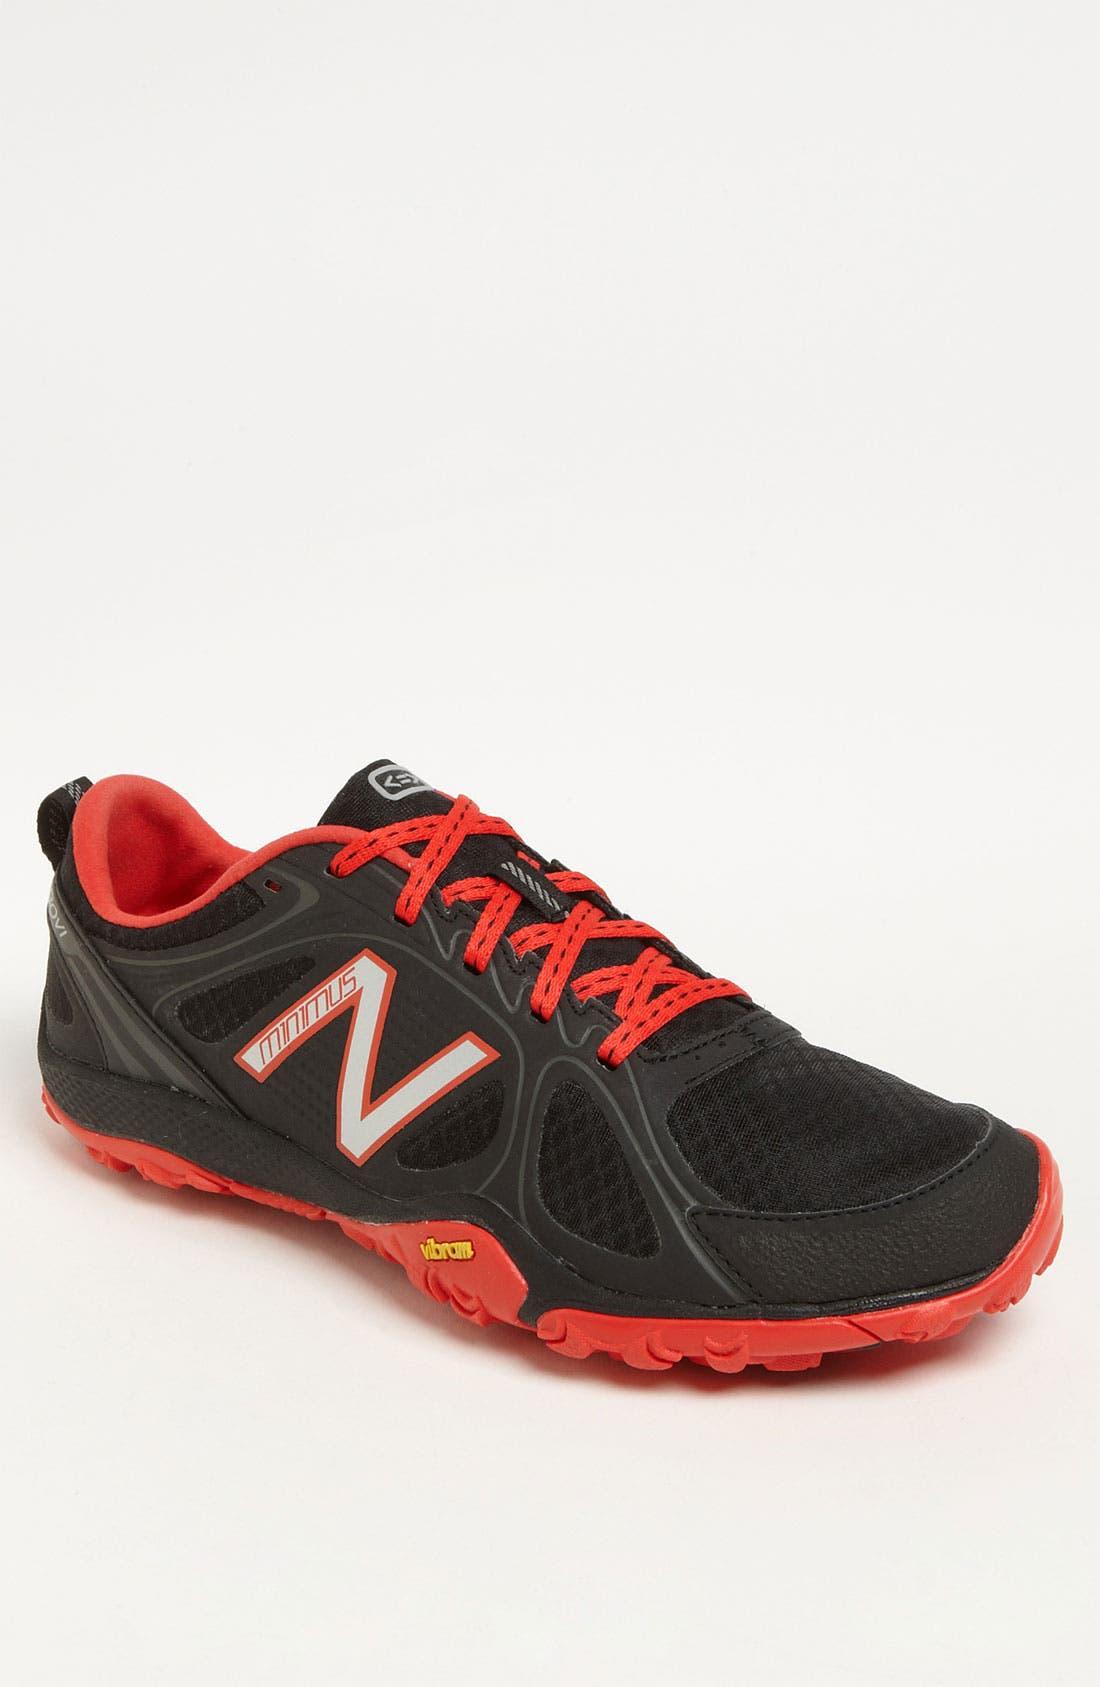 Main Image - New Balance 'MO80' Trail Running Shoe (Men)